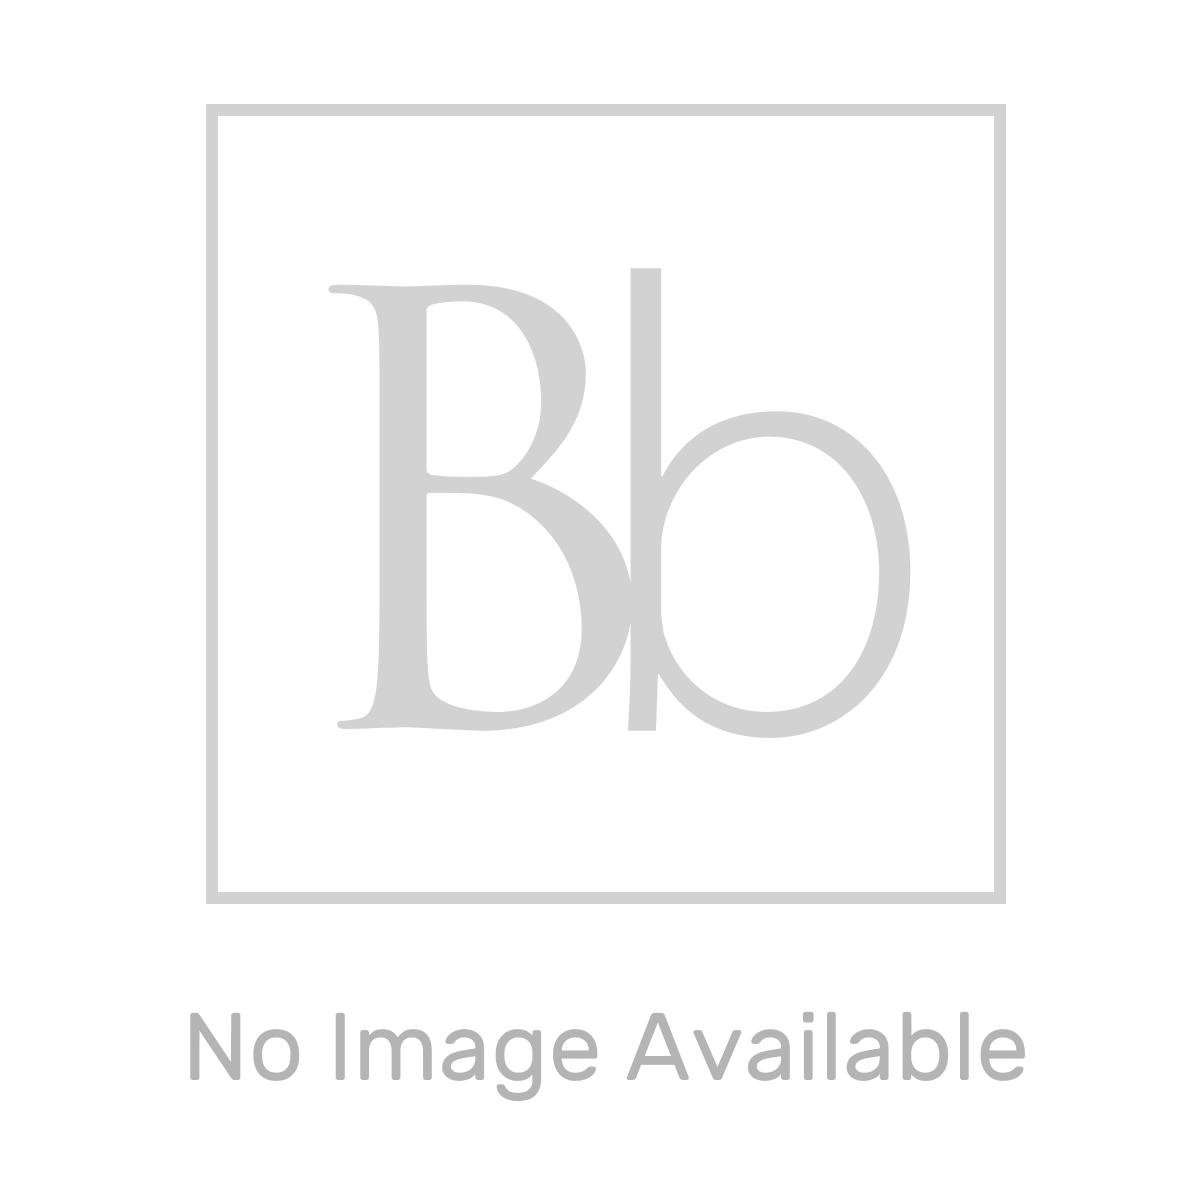 Premier Linton Shower Bath with Square Bath Screen